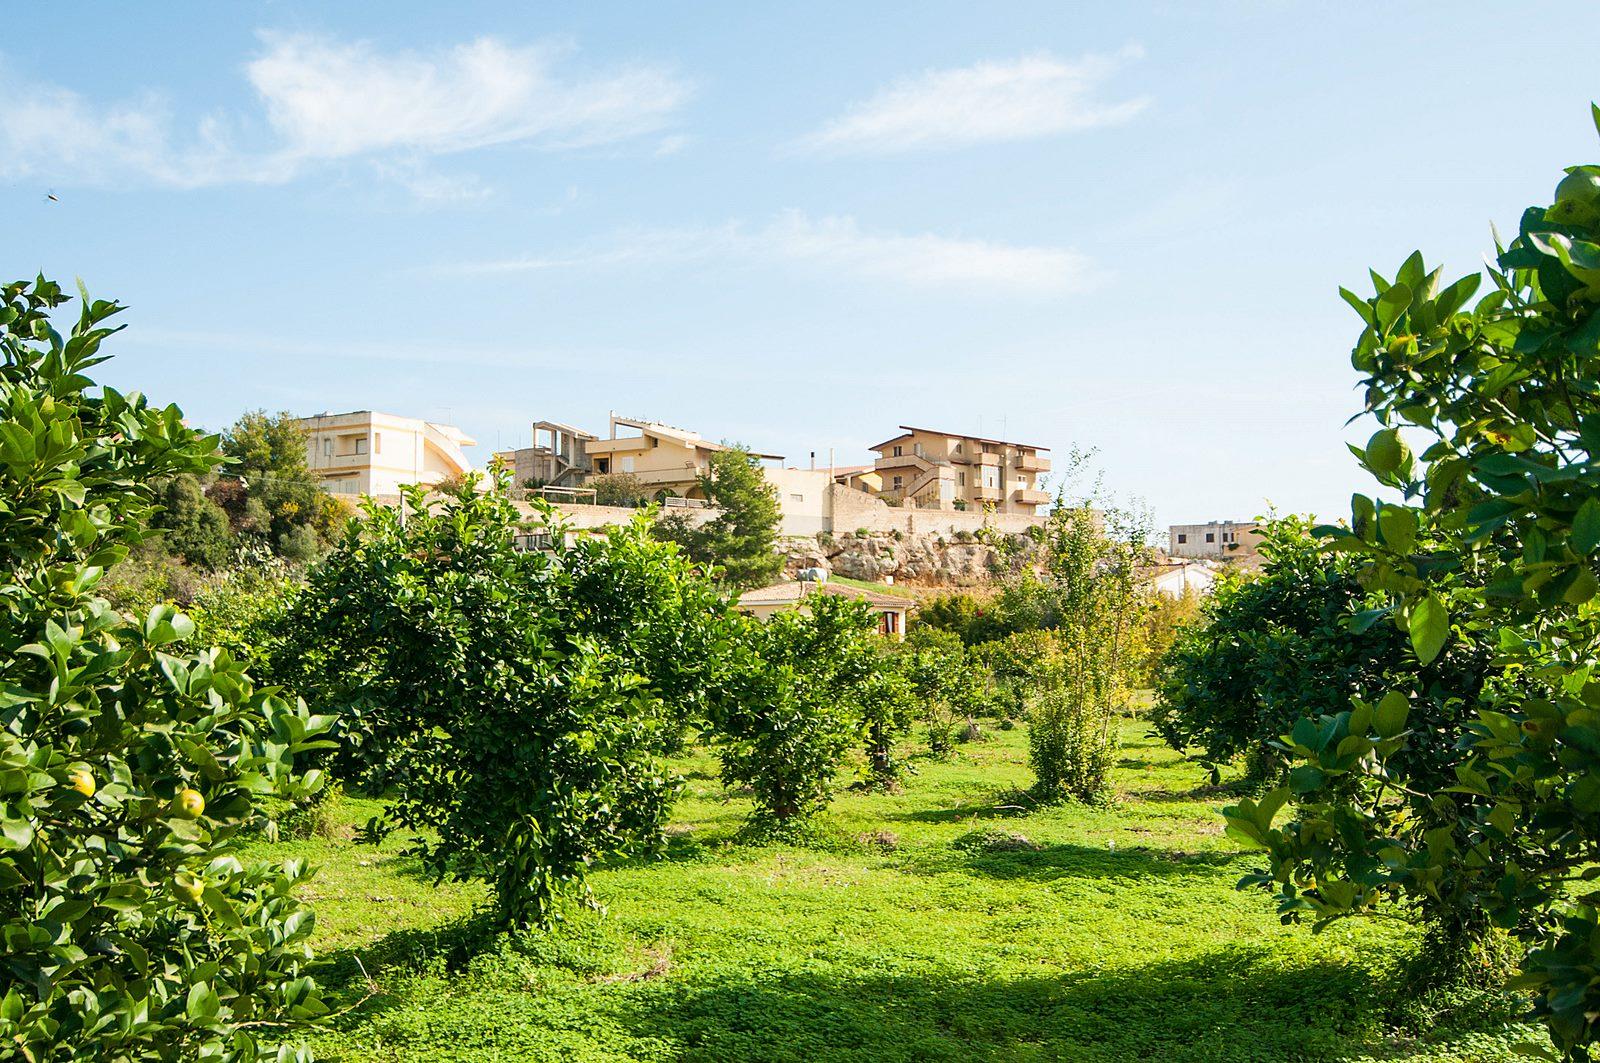 Maison de vacances Villetta a Lido (1540086), Lido di Noto, Siracusa, Sicile, Italie, image 29